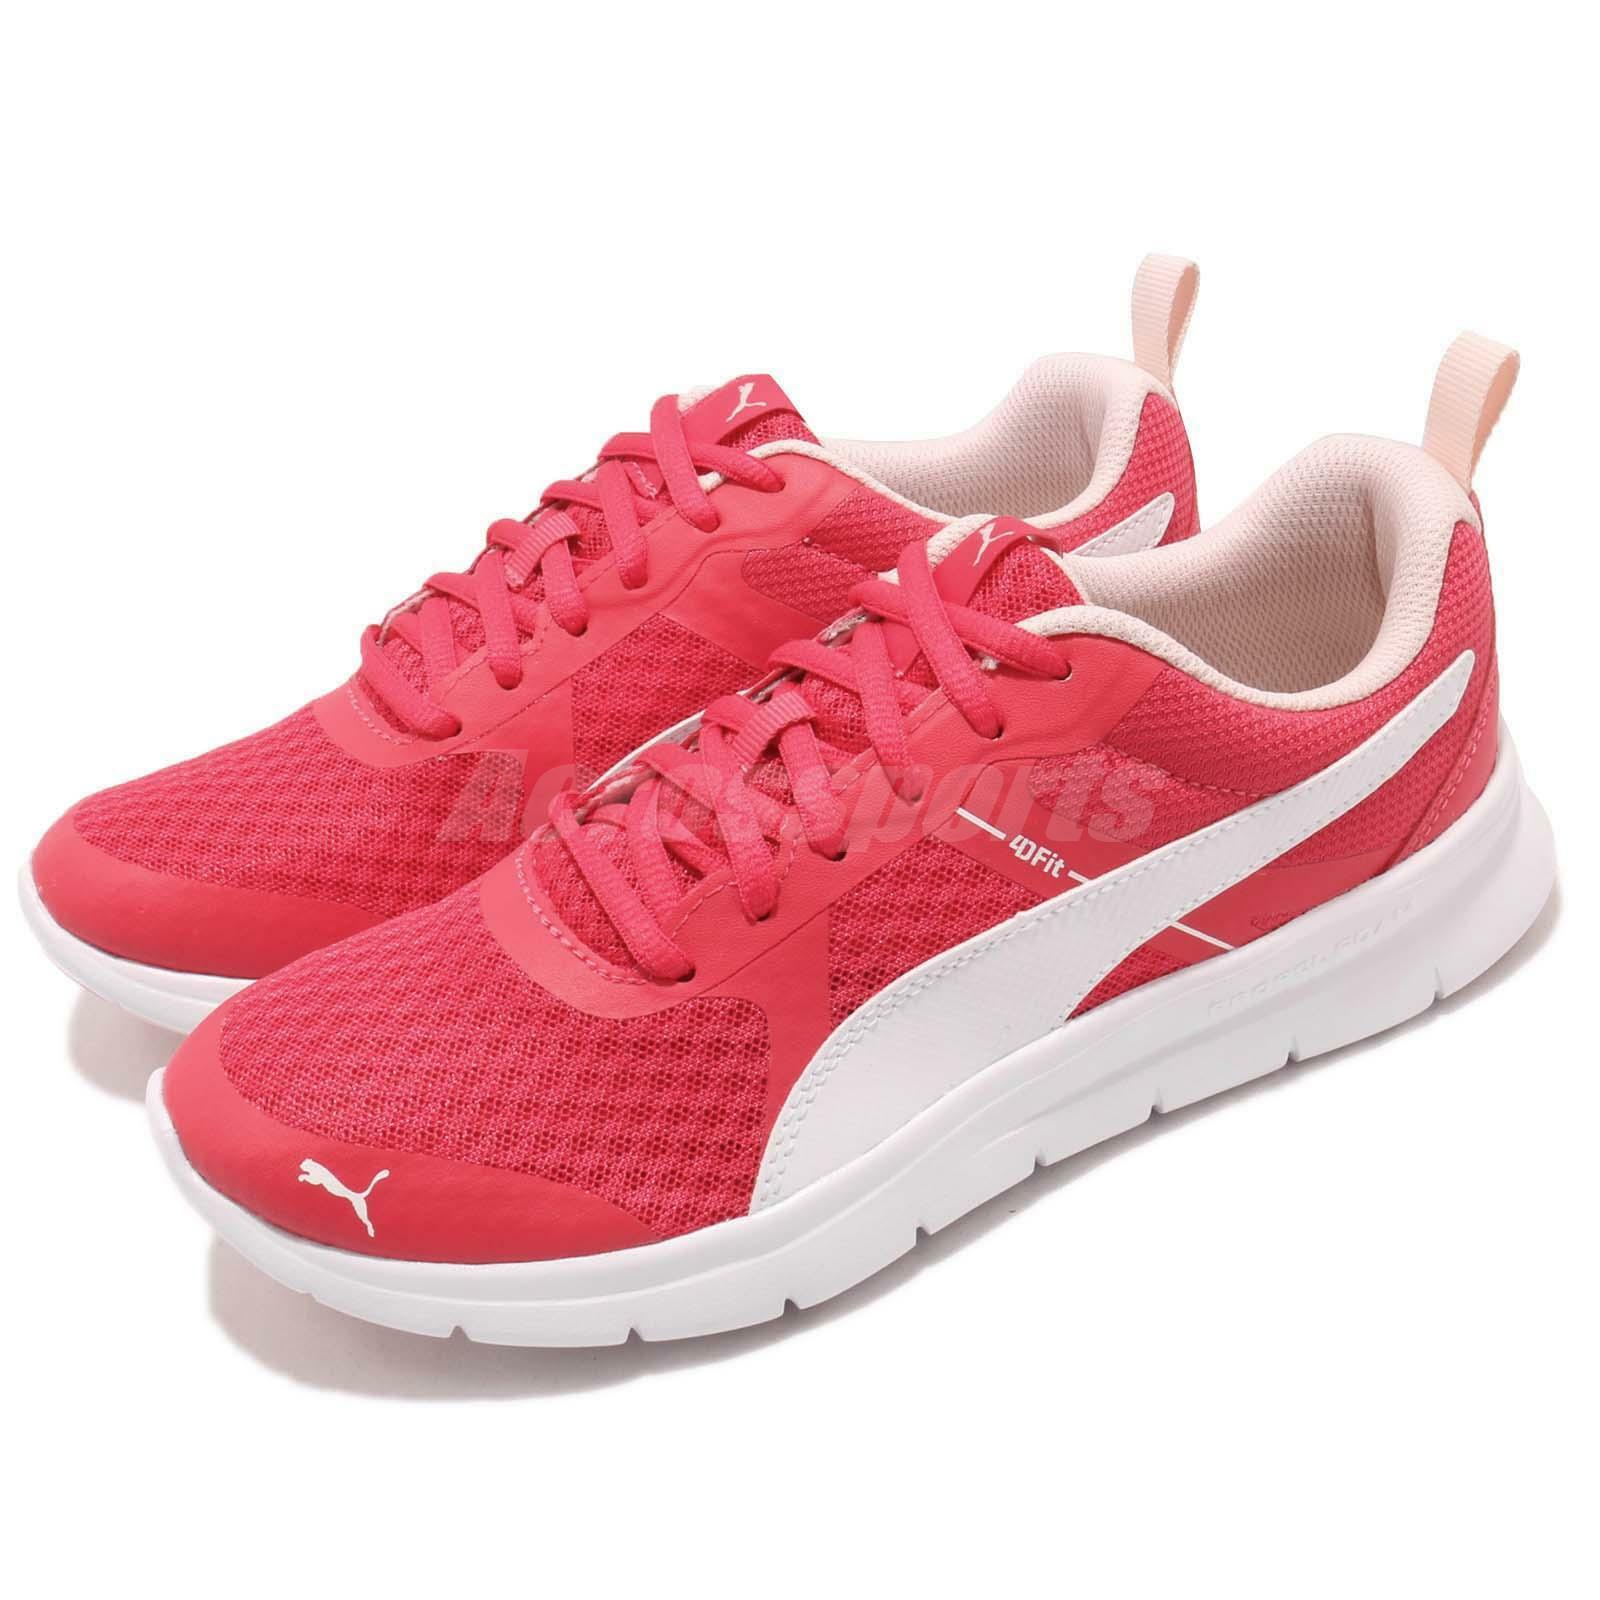 Puma Flex Essential Pink White Men Women Running shoes Sneakers 365268-06